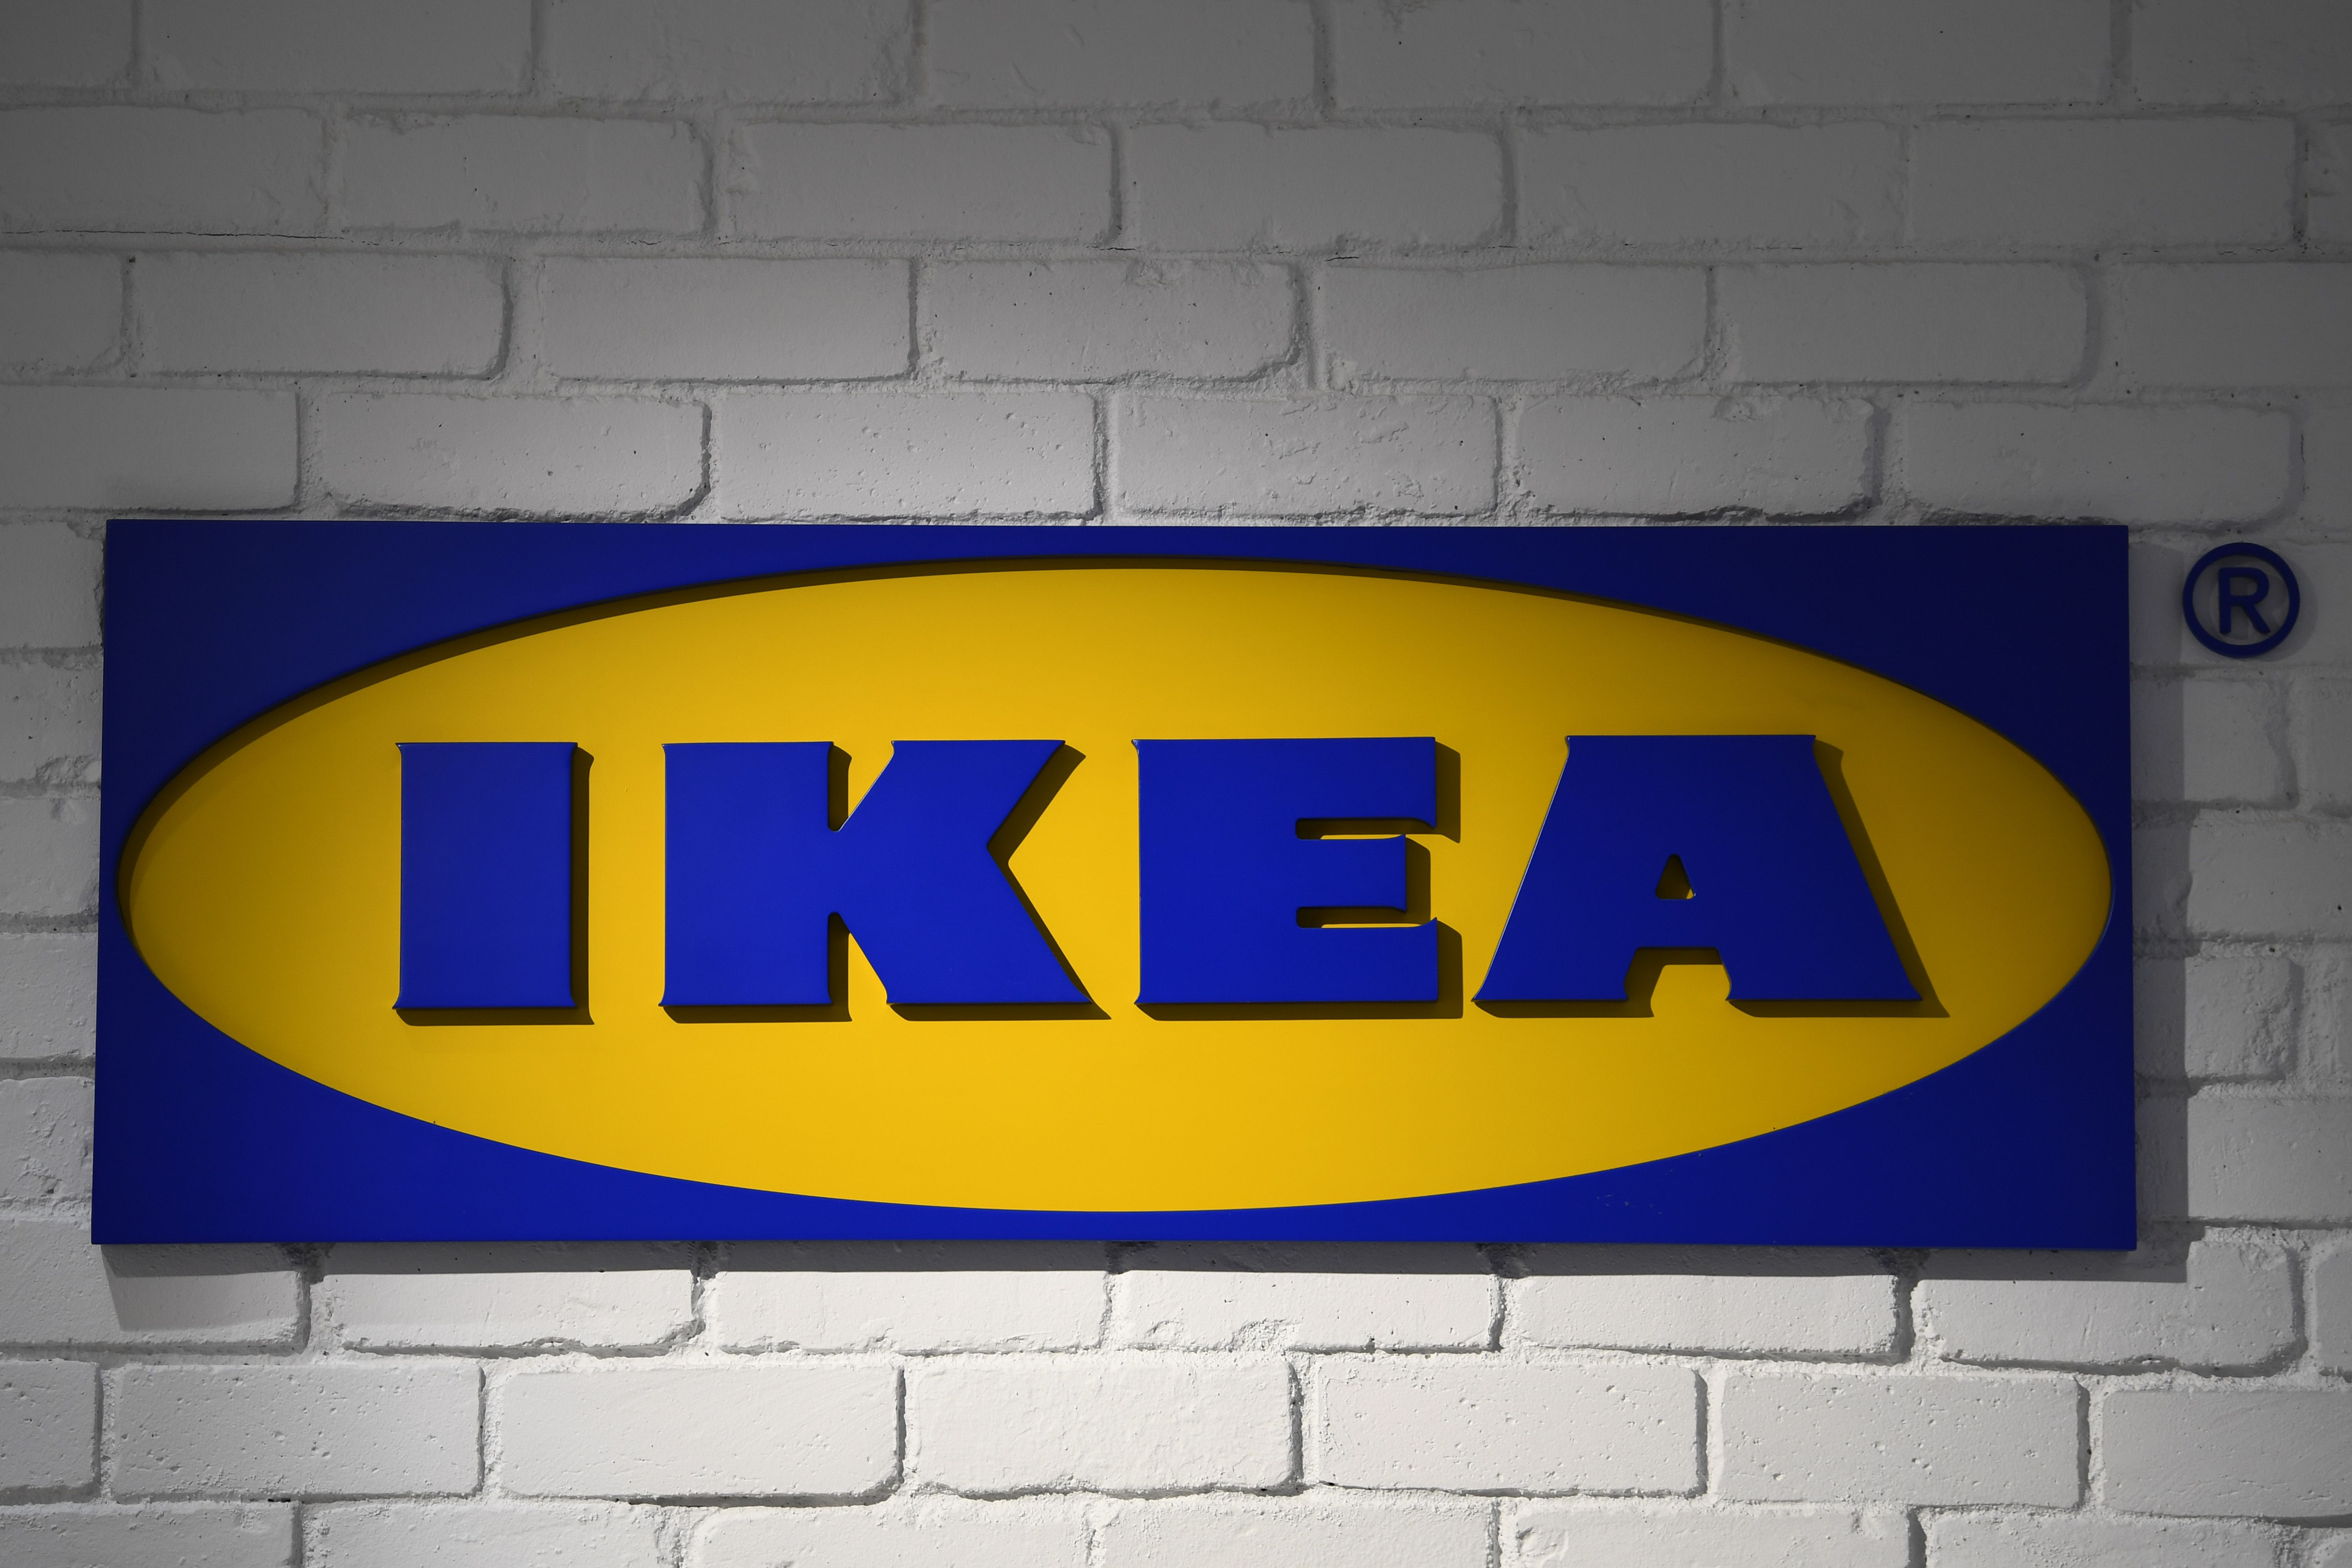 Ikea shares recipe for iconic Swedish meatballs and cream sauce